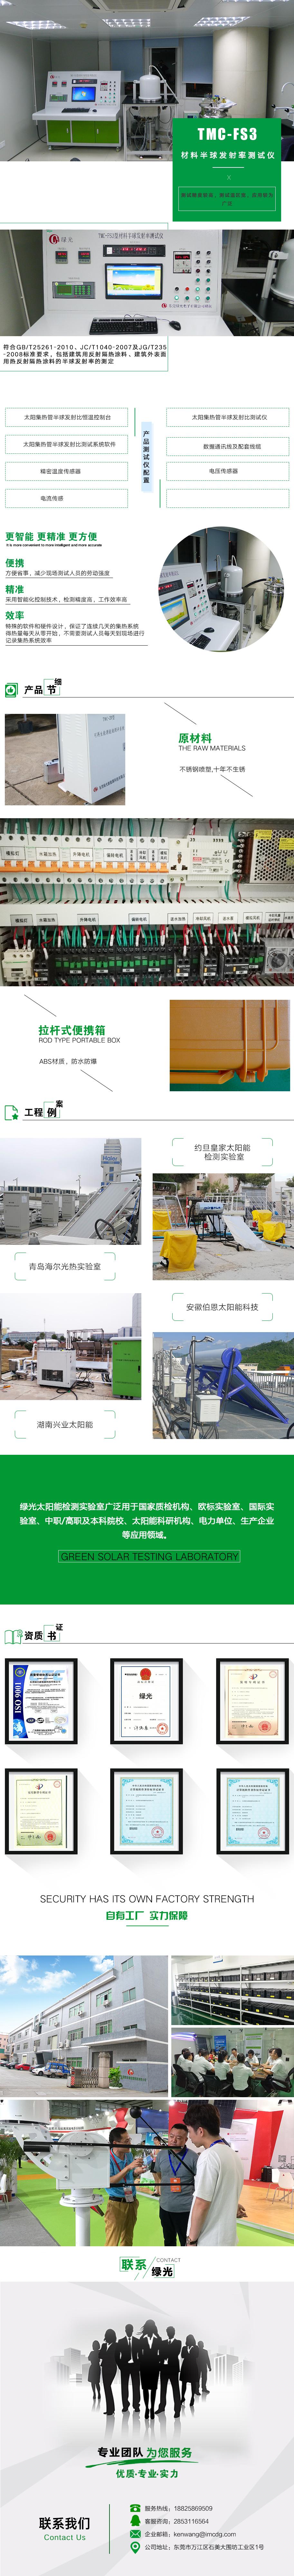 TMC-FS3型材料半球发射率测试.jpg